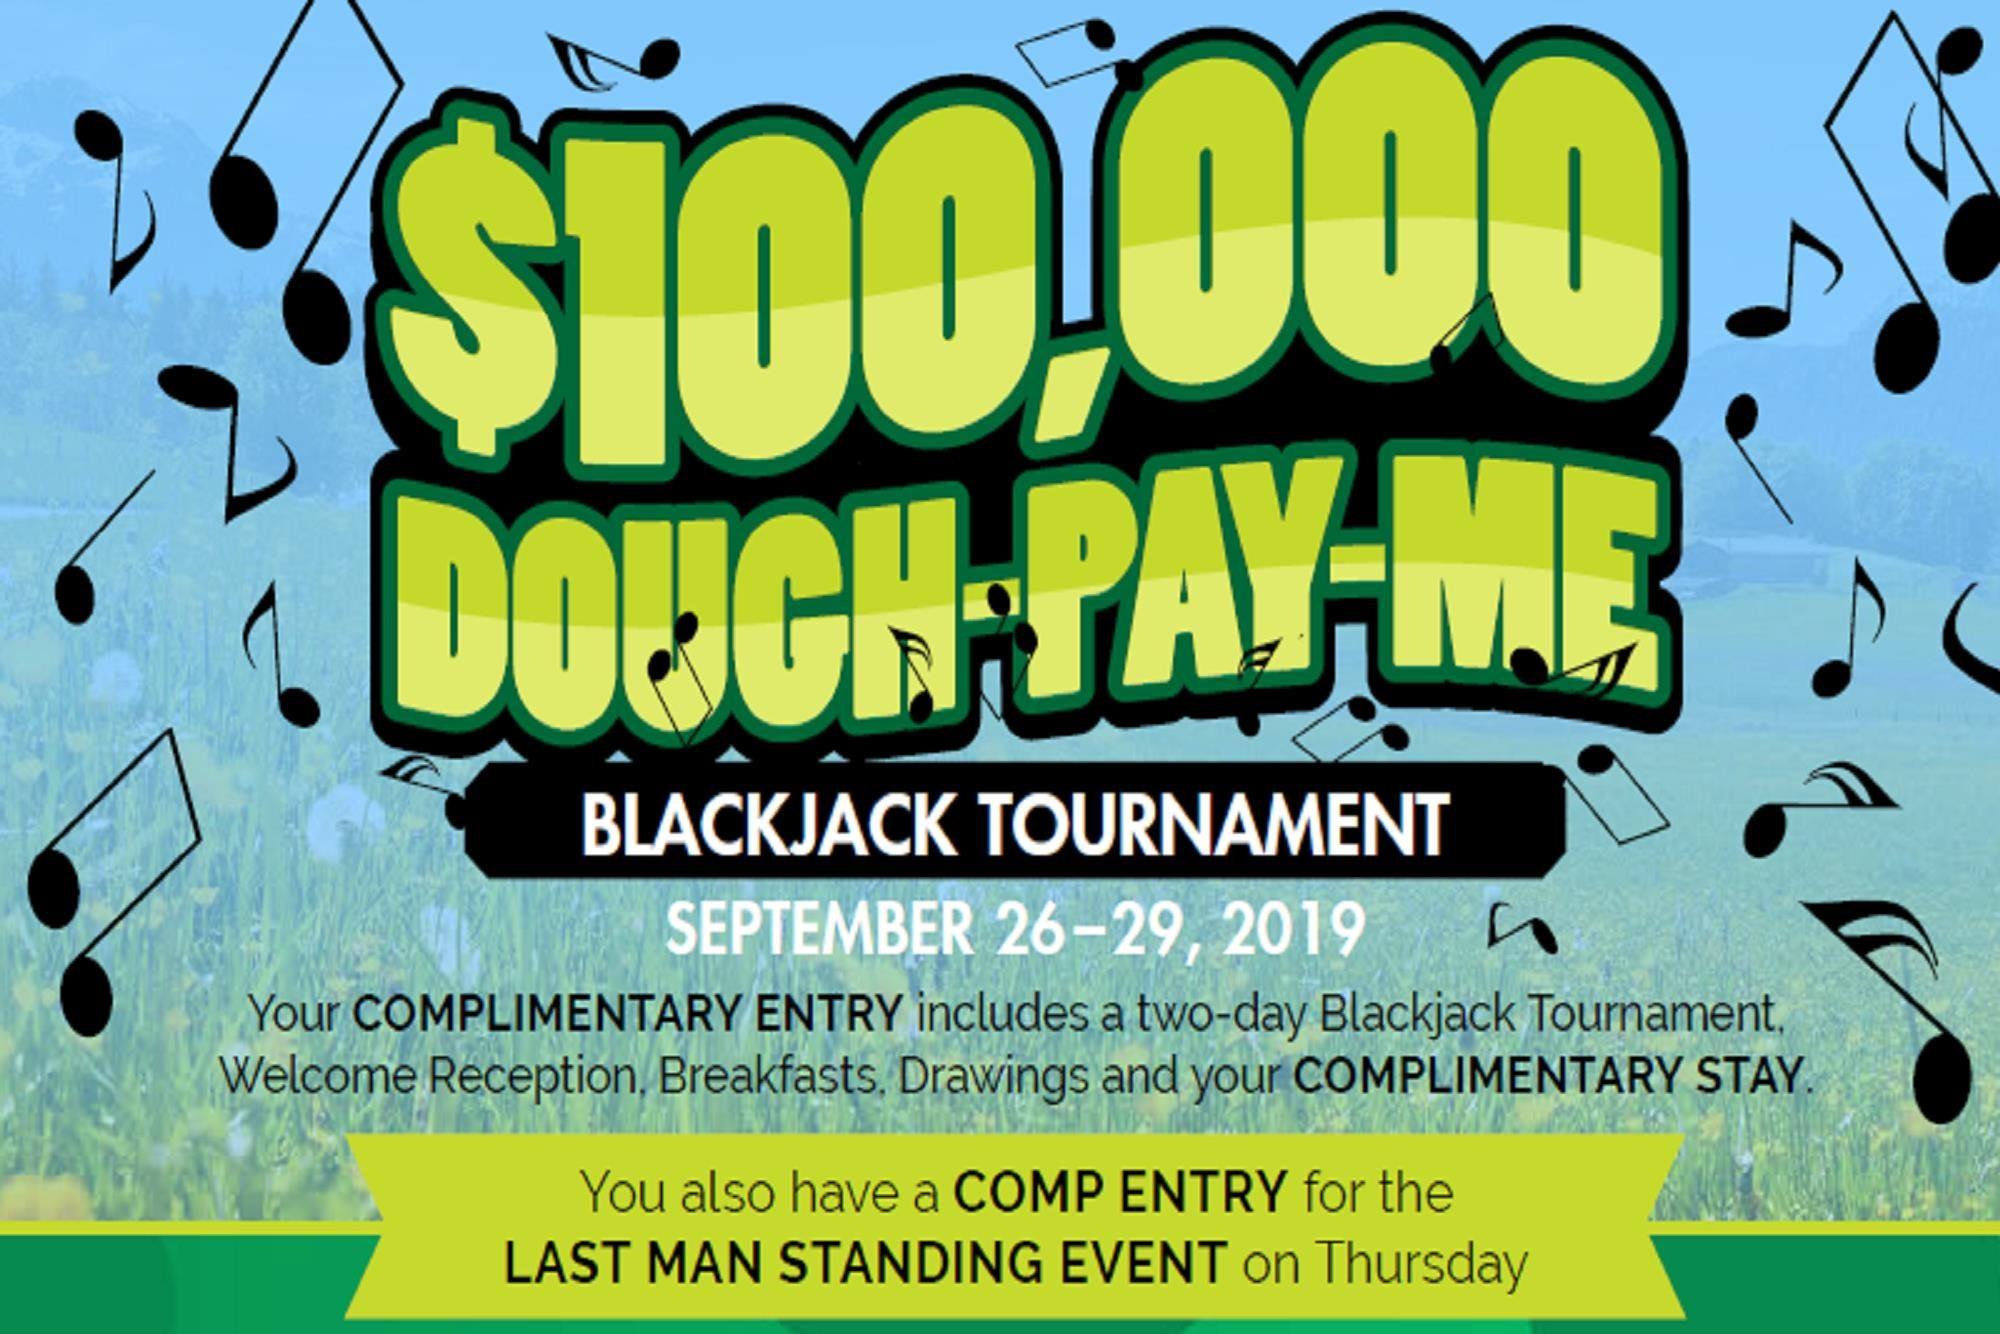 8 deck blackjack strategy chart